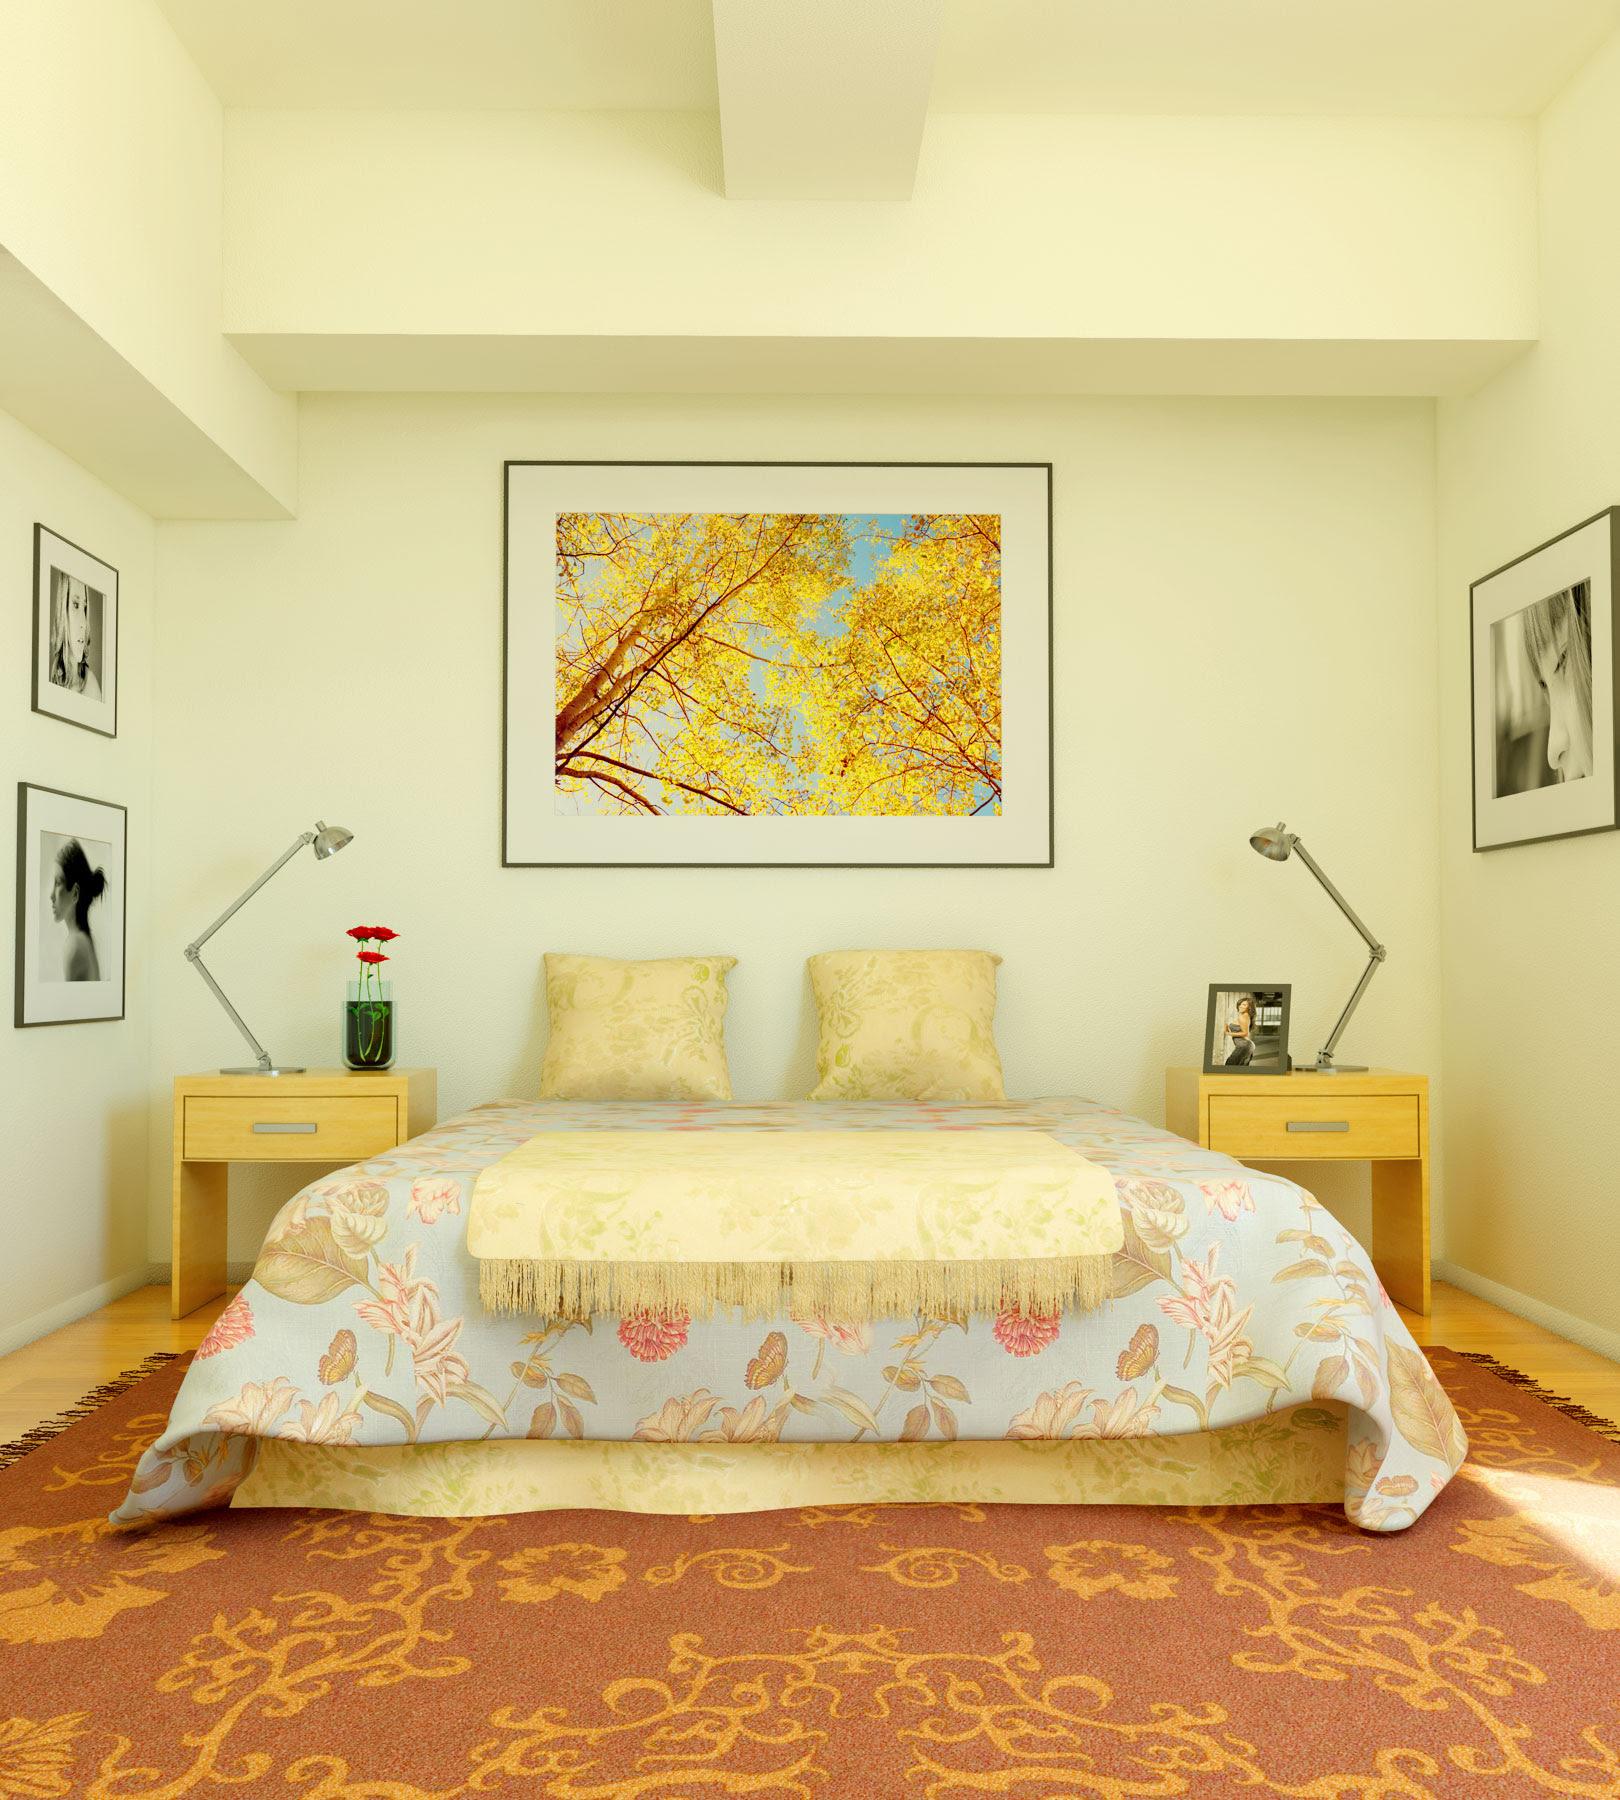 Sleek Bedrooms with Cool